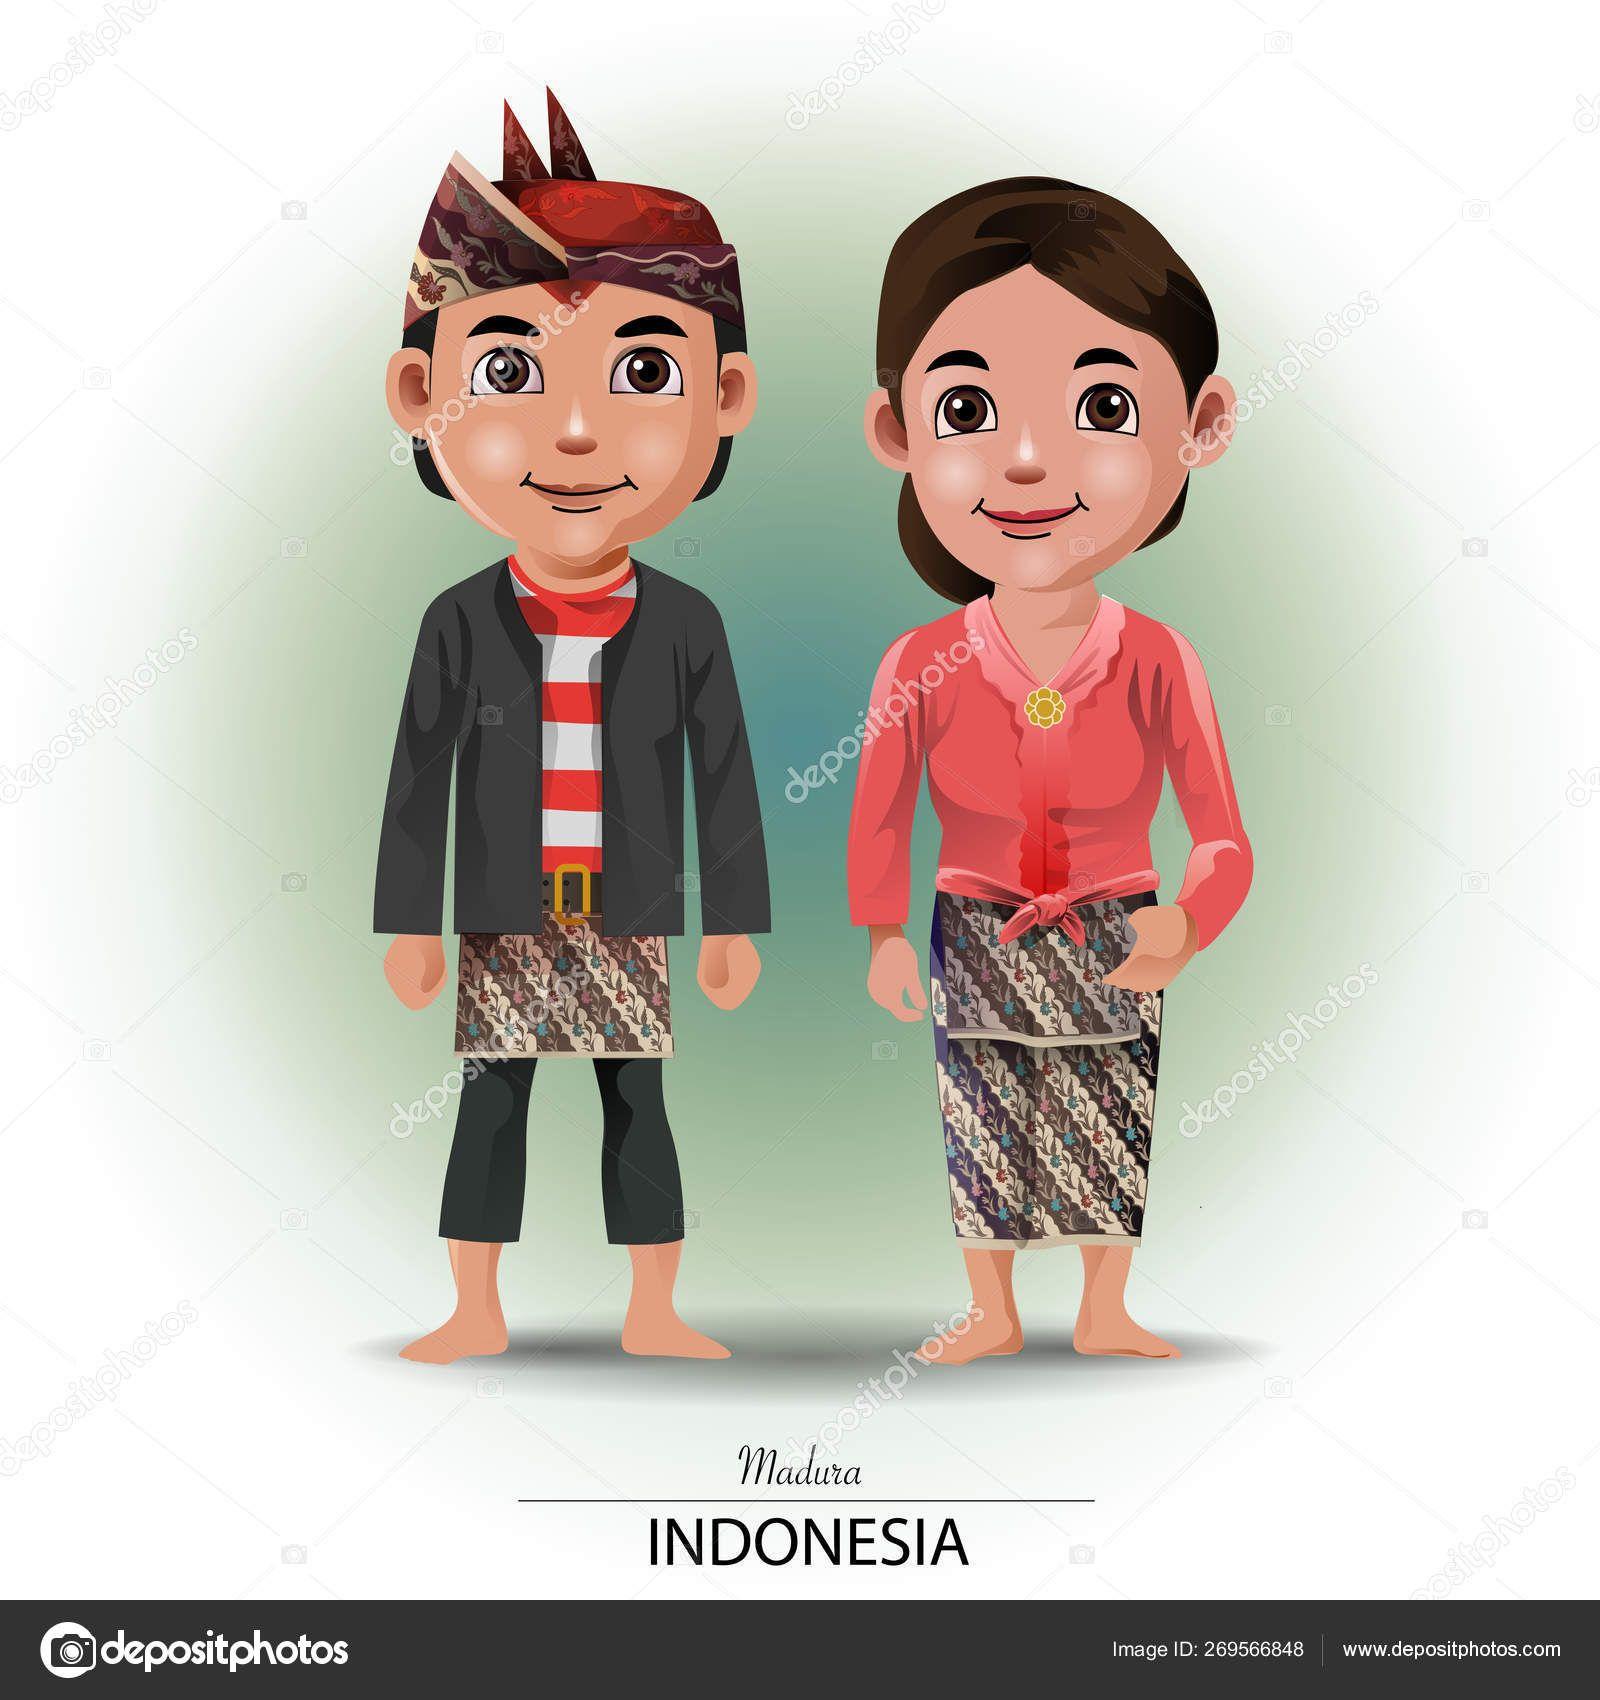 Kartun Pakaian Adat Sumatera Barat